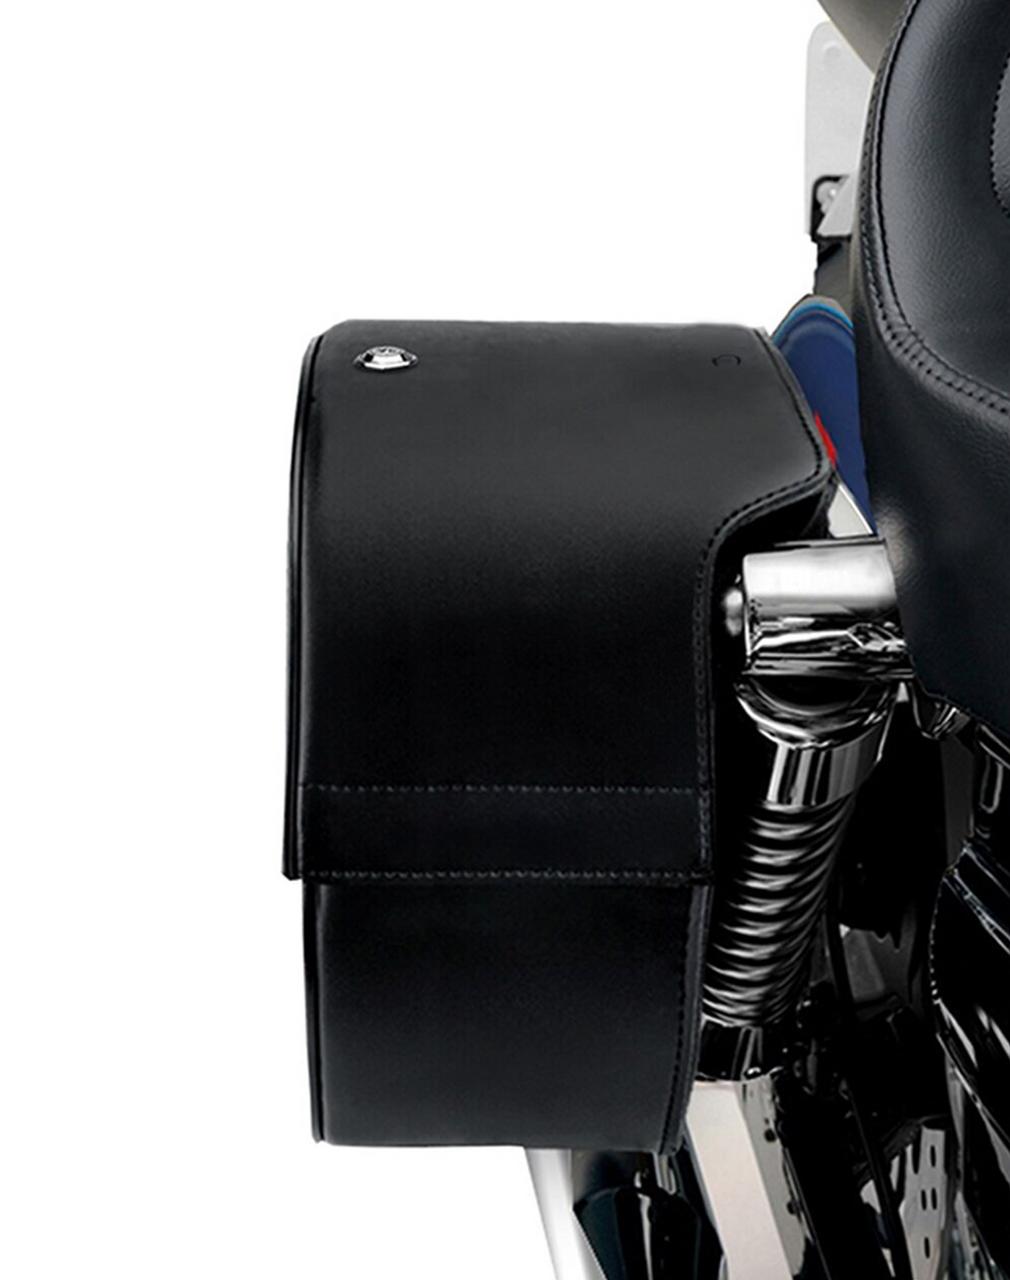 Triumph Thunderbird Single Strap Shock Cutout Slanted Large Motorcycle Saddlebags Shock Cutout View